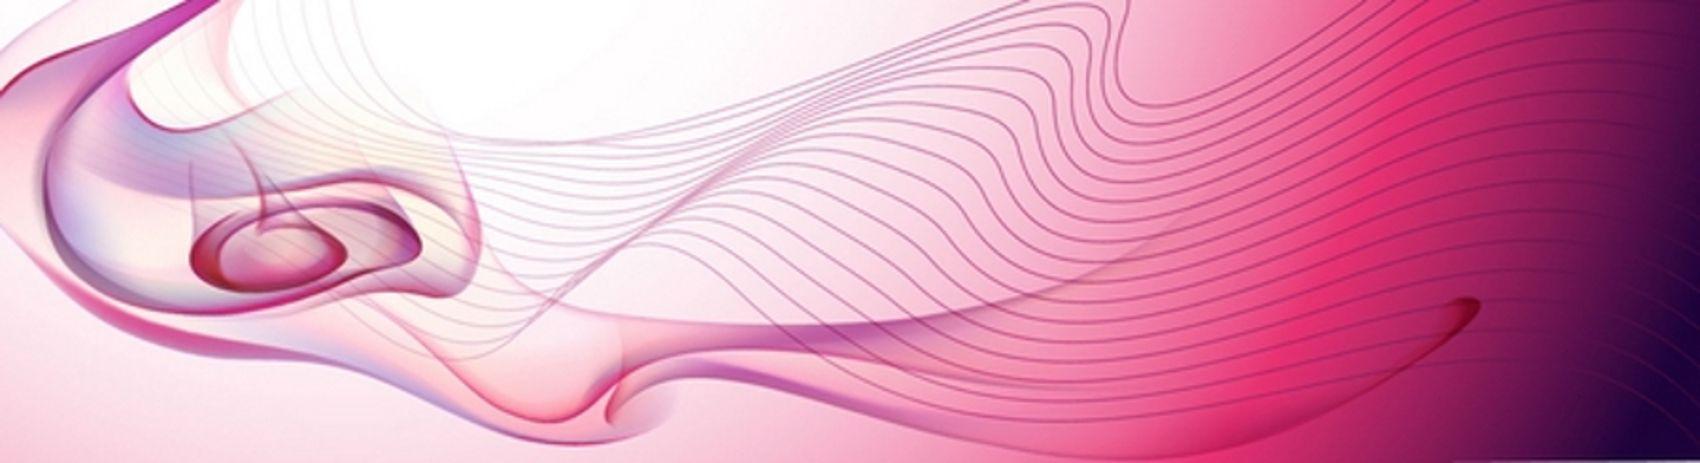 бело-розовая абстракция